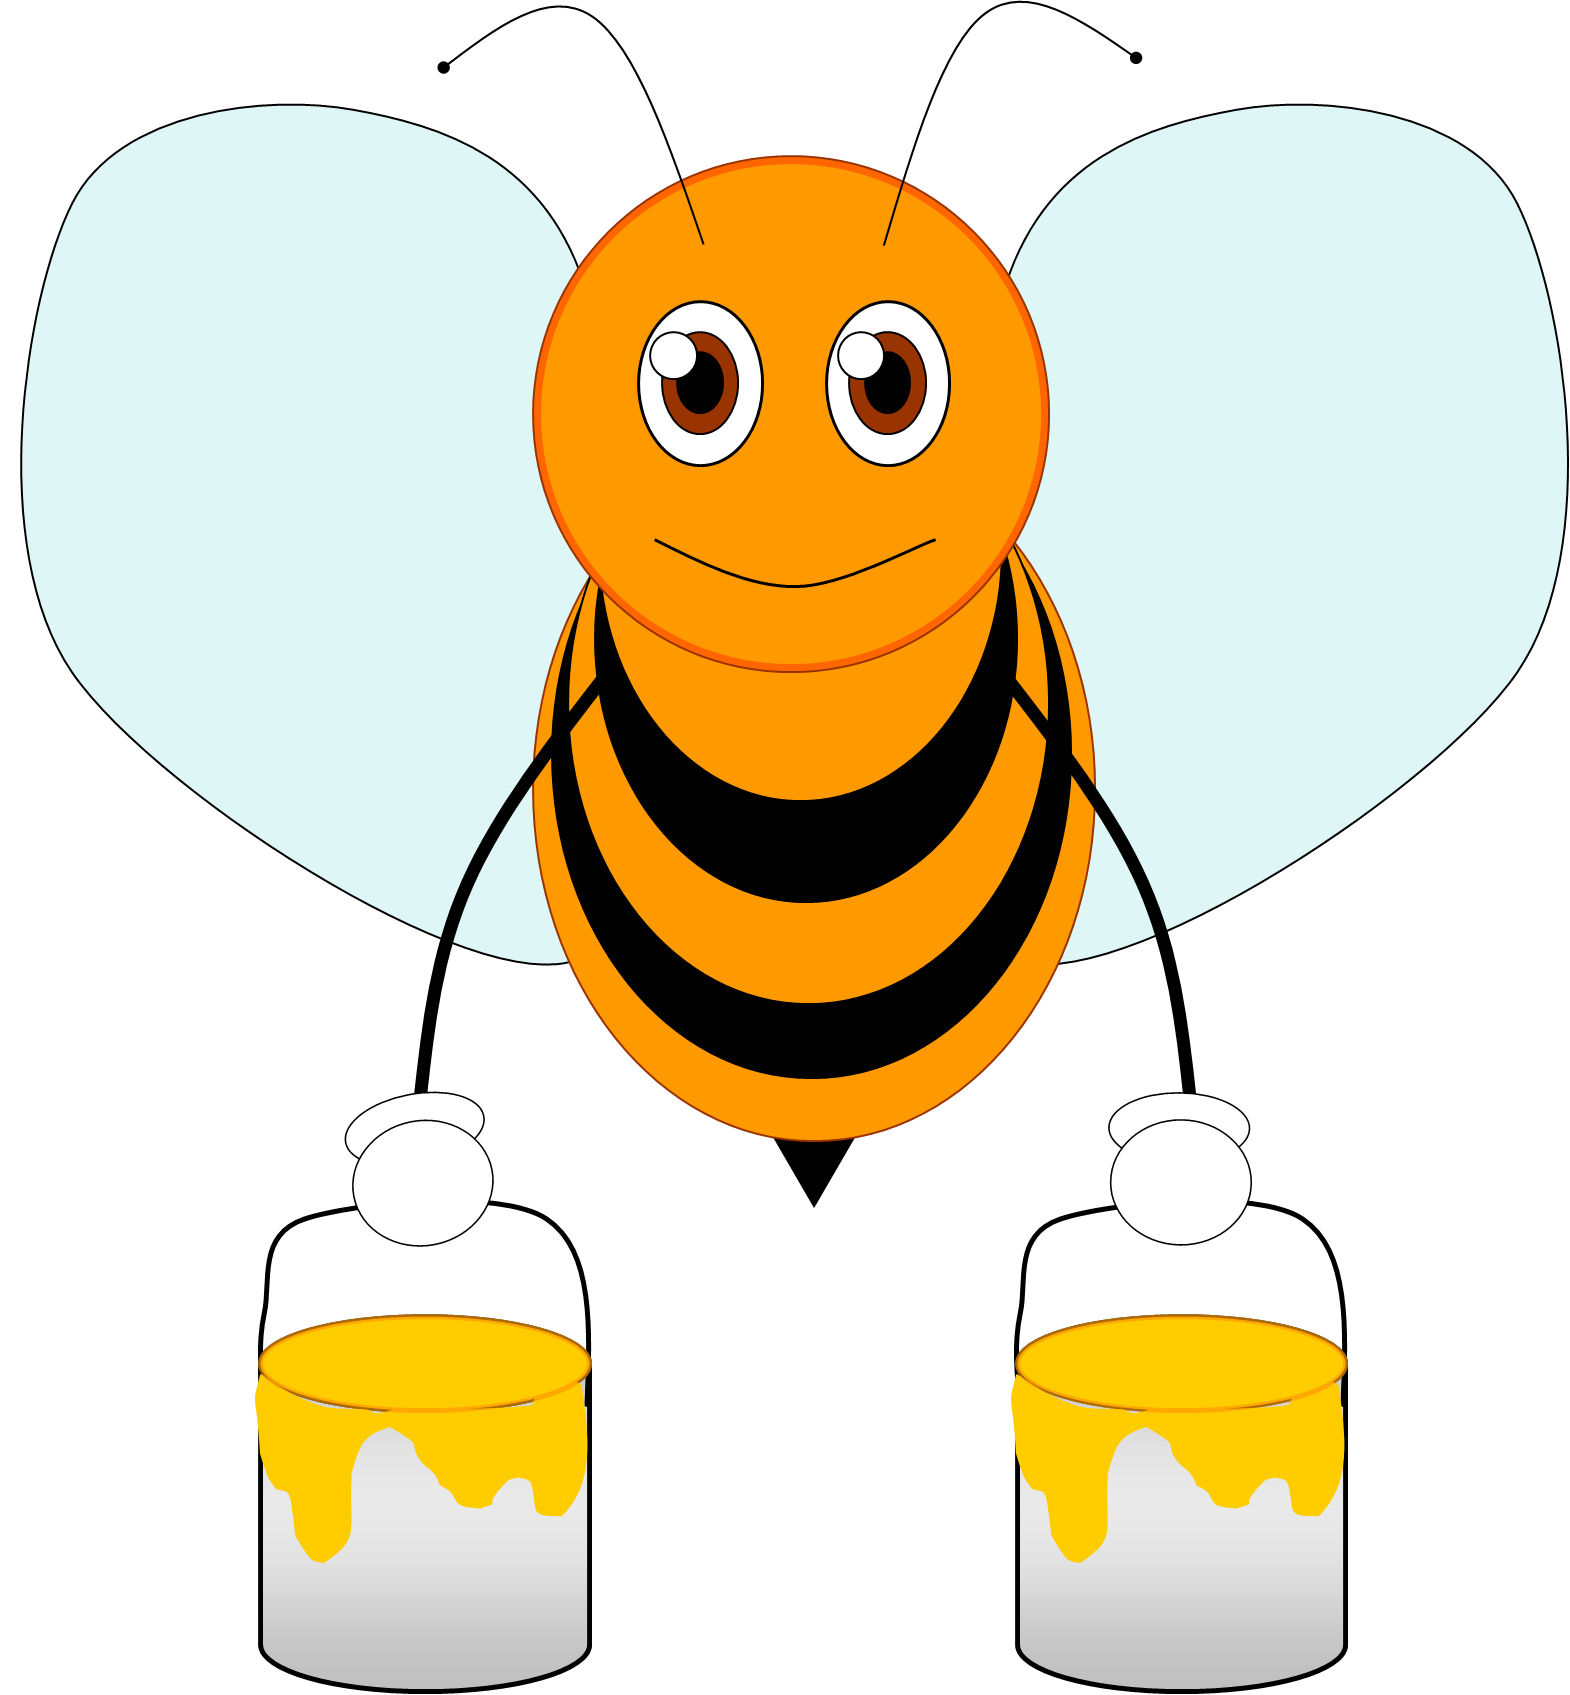 Bee 2 | Free Images at Clker.com - vector clip art online ...